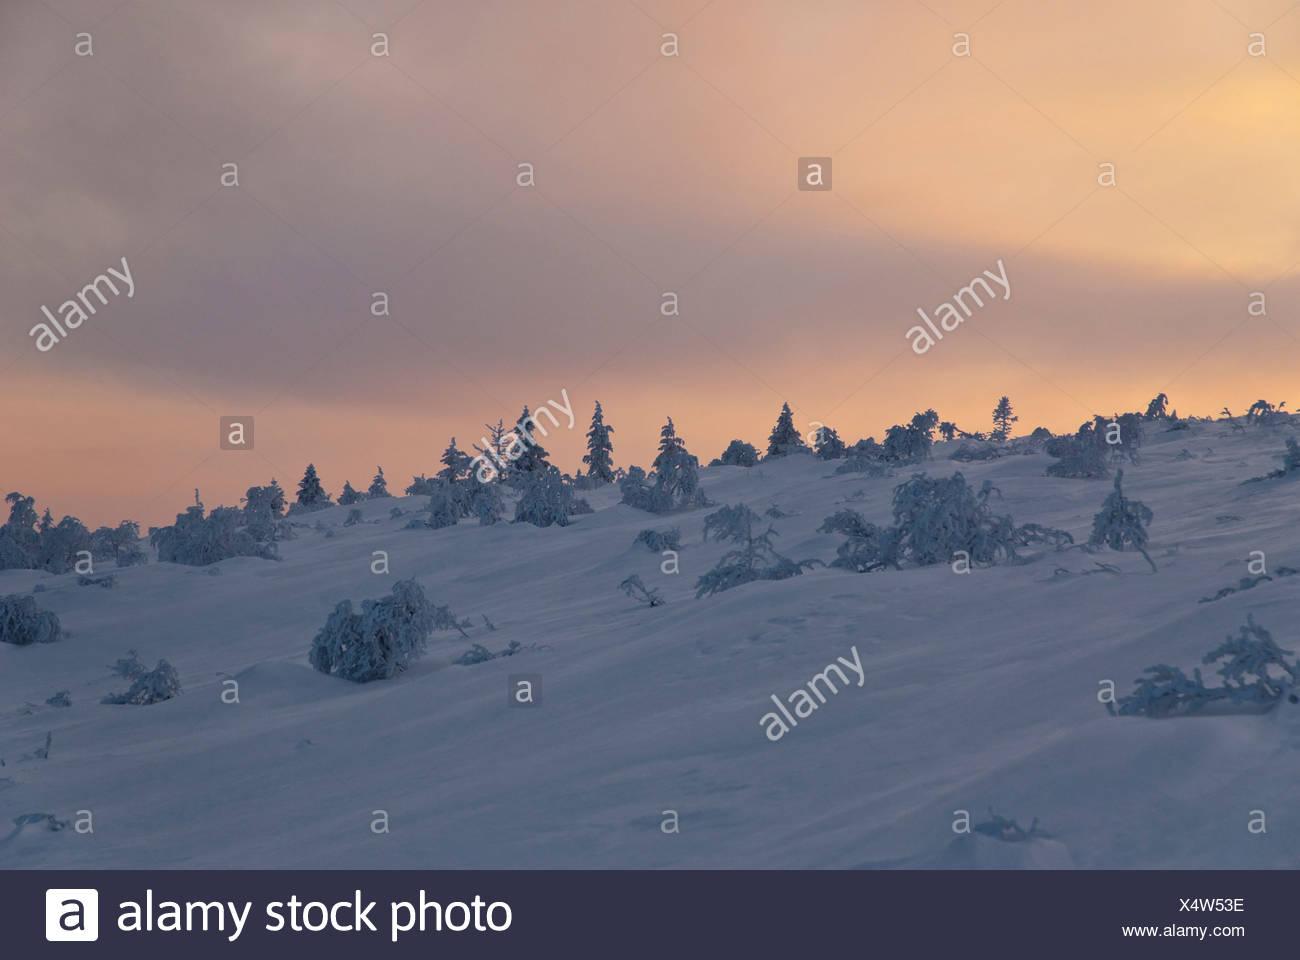 Arktis, Baum-Grenze, boreal, Nadel-Wald, Einsamkeit, Europa, Finnland, Fjell, Fjall, Kiilopaa, kalt, Lappland, Melancholie, Stockbild